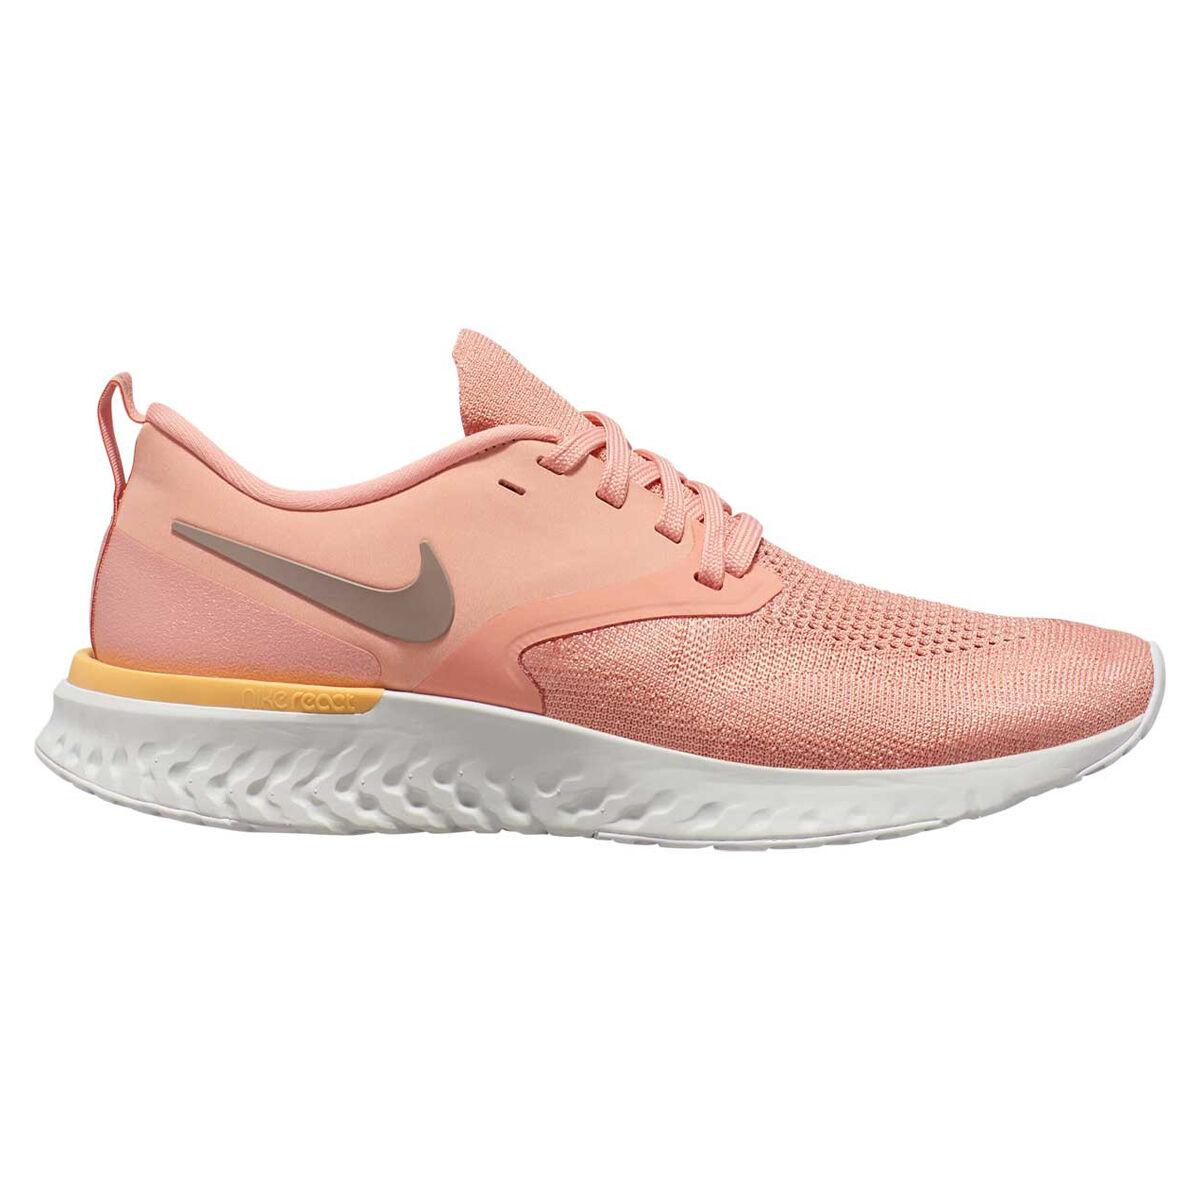 Adidas Womens Beach Surf Shoes 2 : Women,Nike Clothing